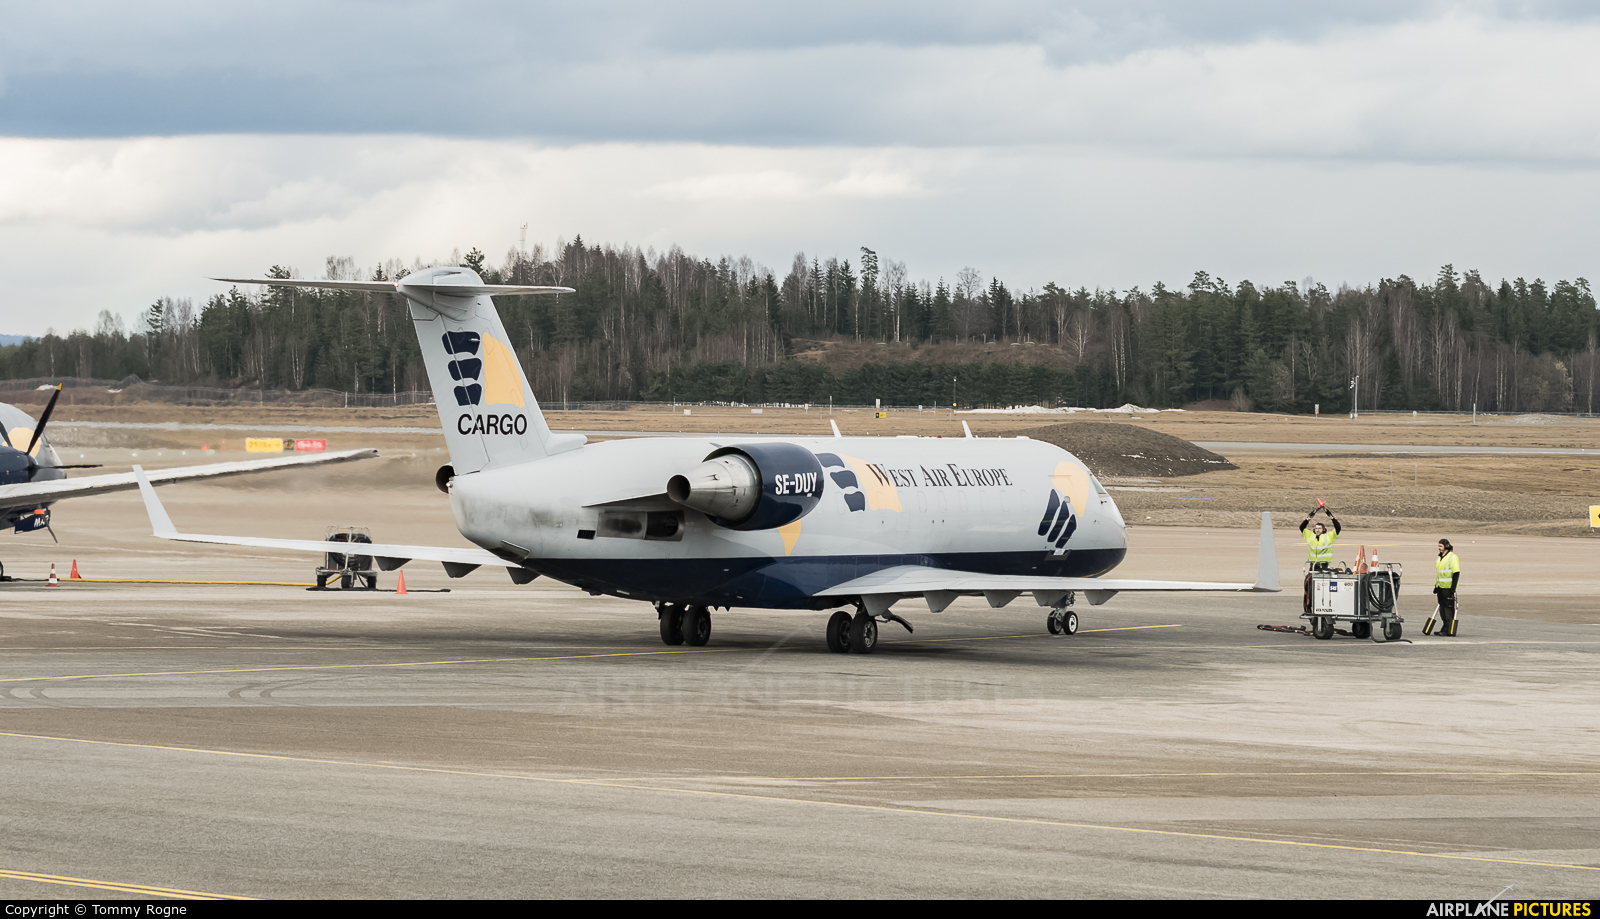 West Air Sweden SE-DUY aircraft at Oslo - Gardermoen